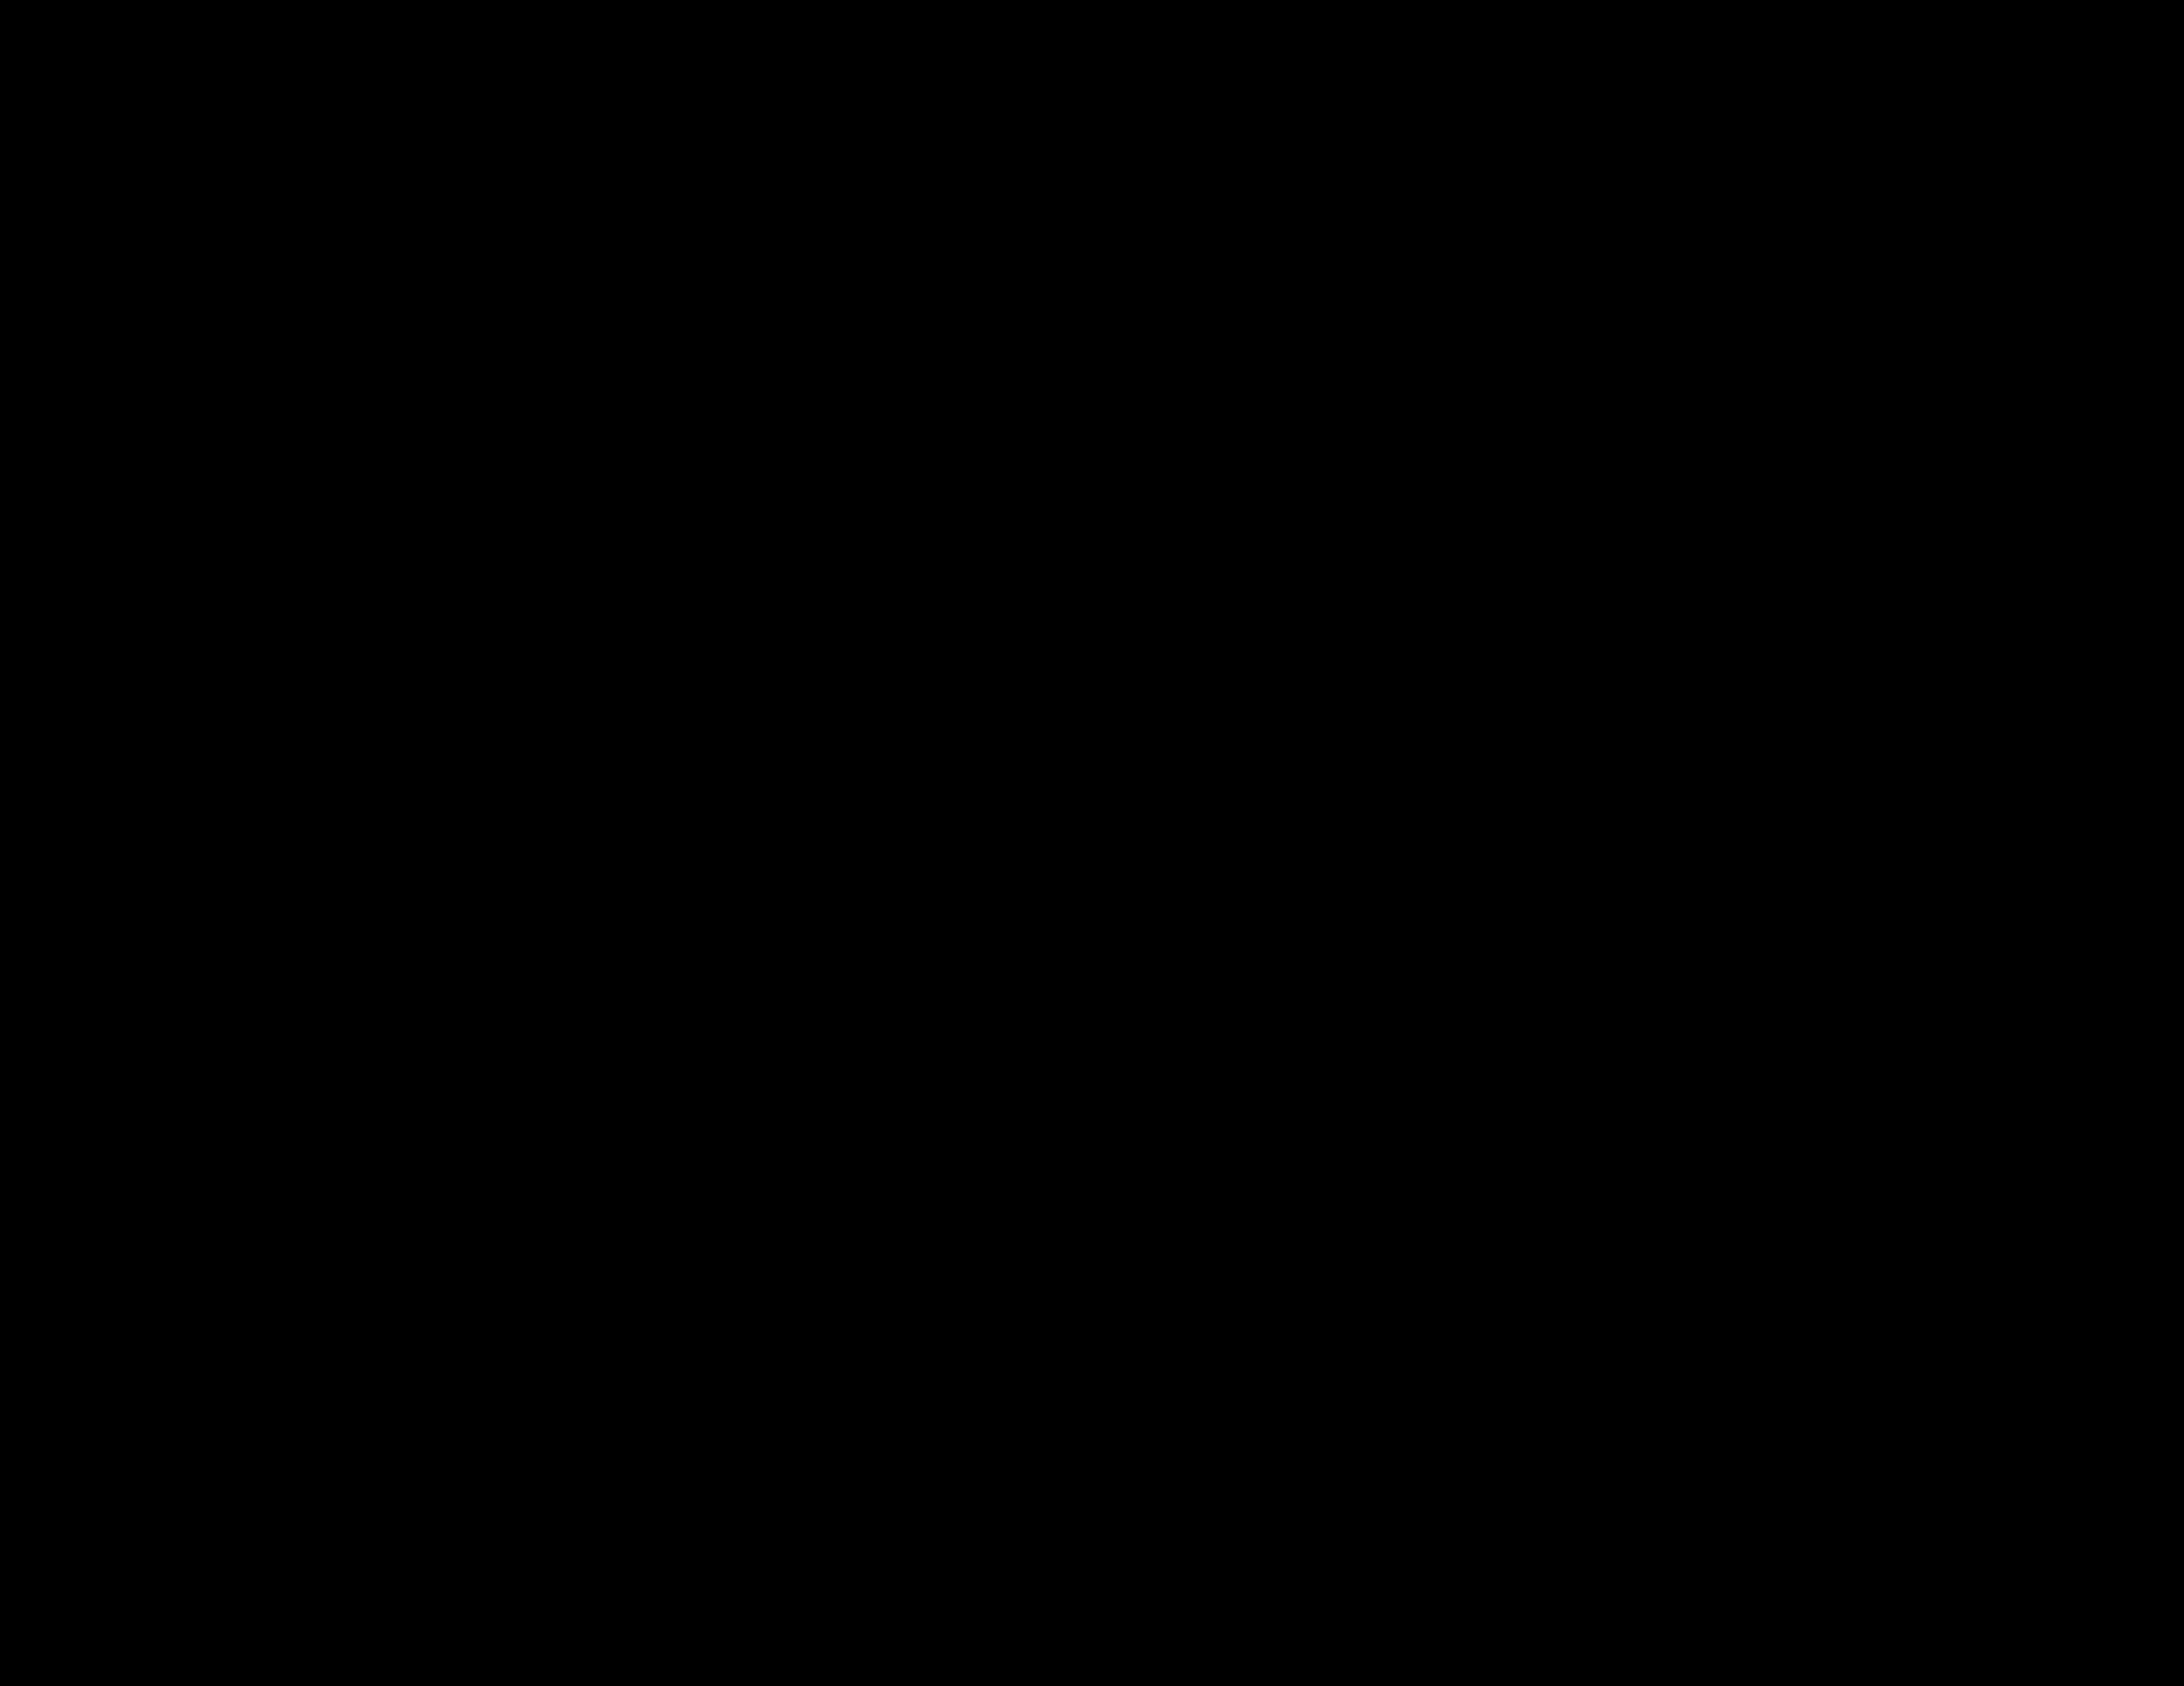 Originator_Floorplan_Level1_Black.png